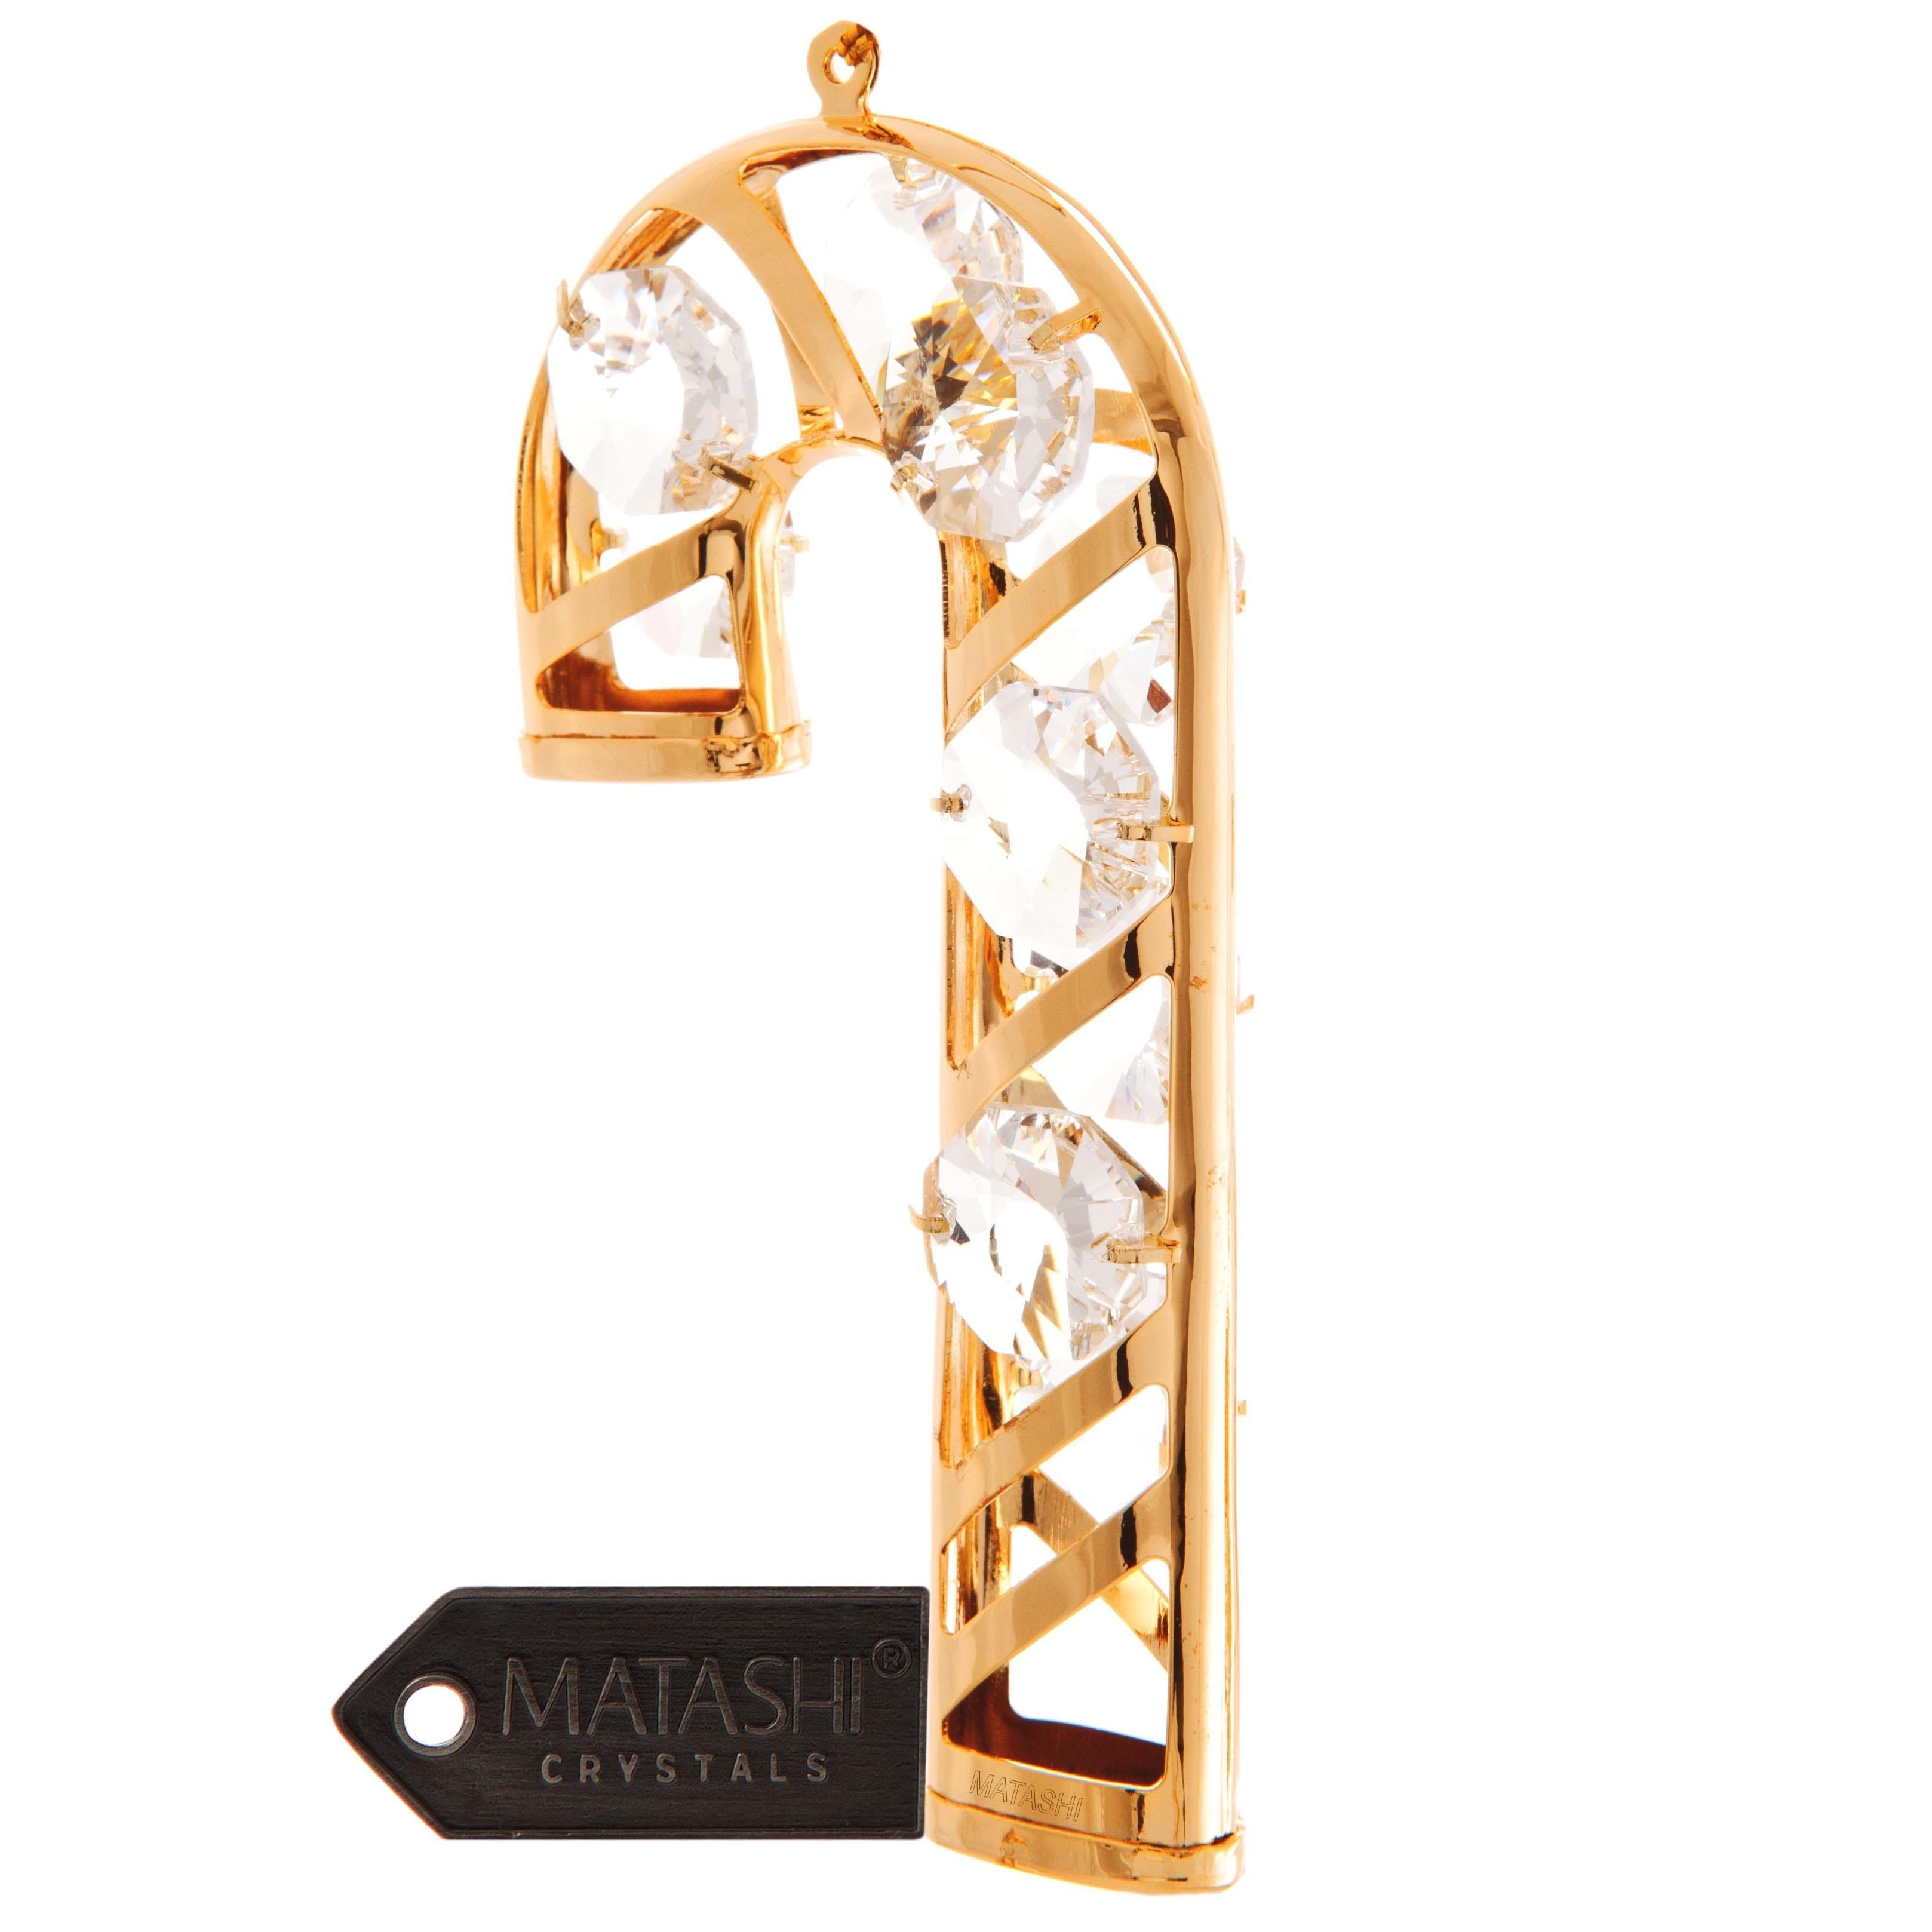 Matashi 24k Goldplated Genuine Crystals Candy Cane Orname...